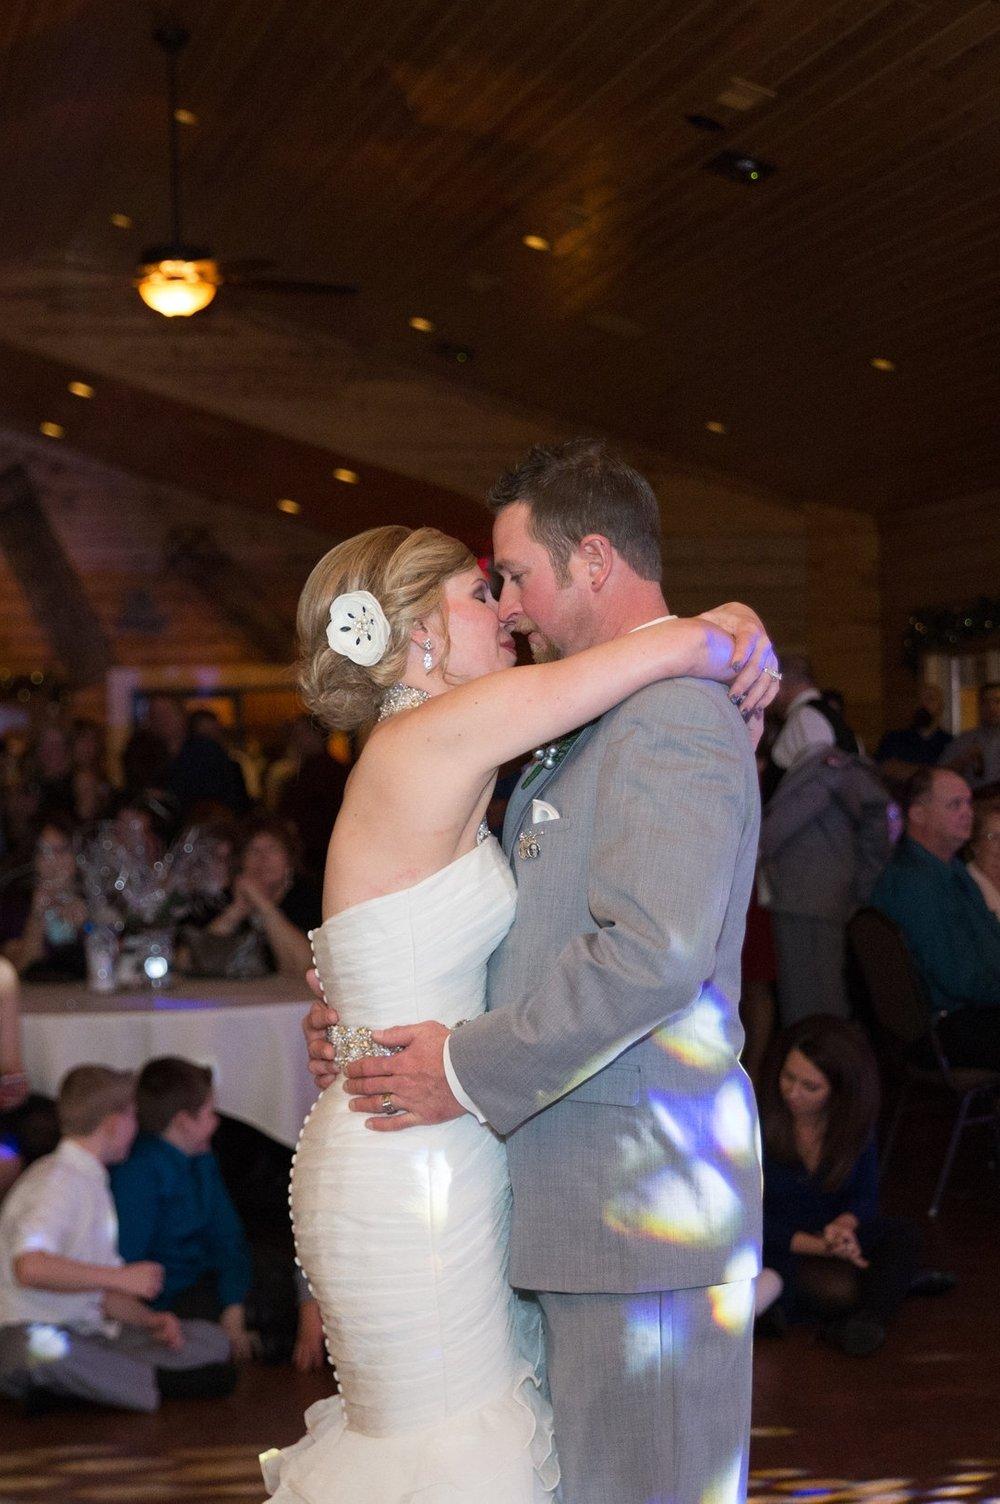 Brillion Wisconsin Wedding Photographer - Whit Meza Photography59.jpg